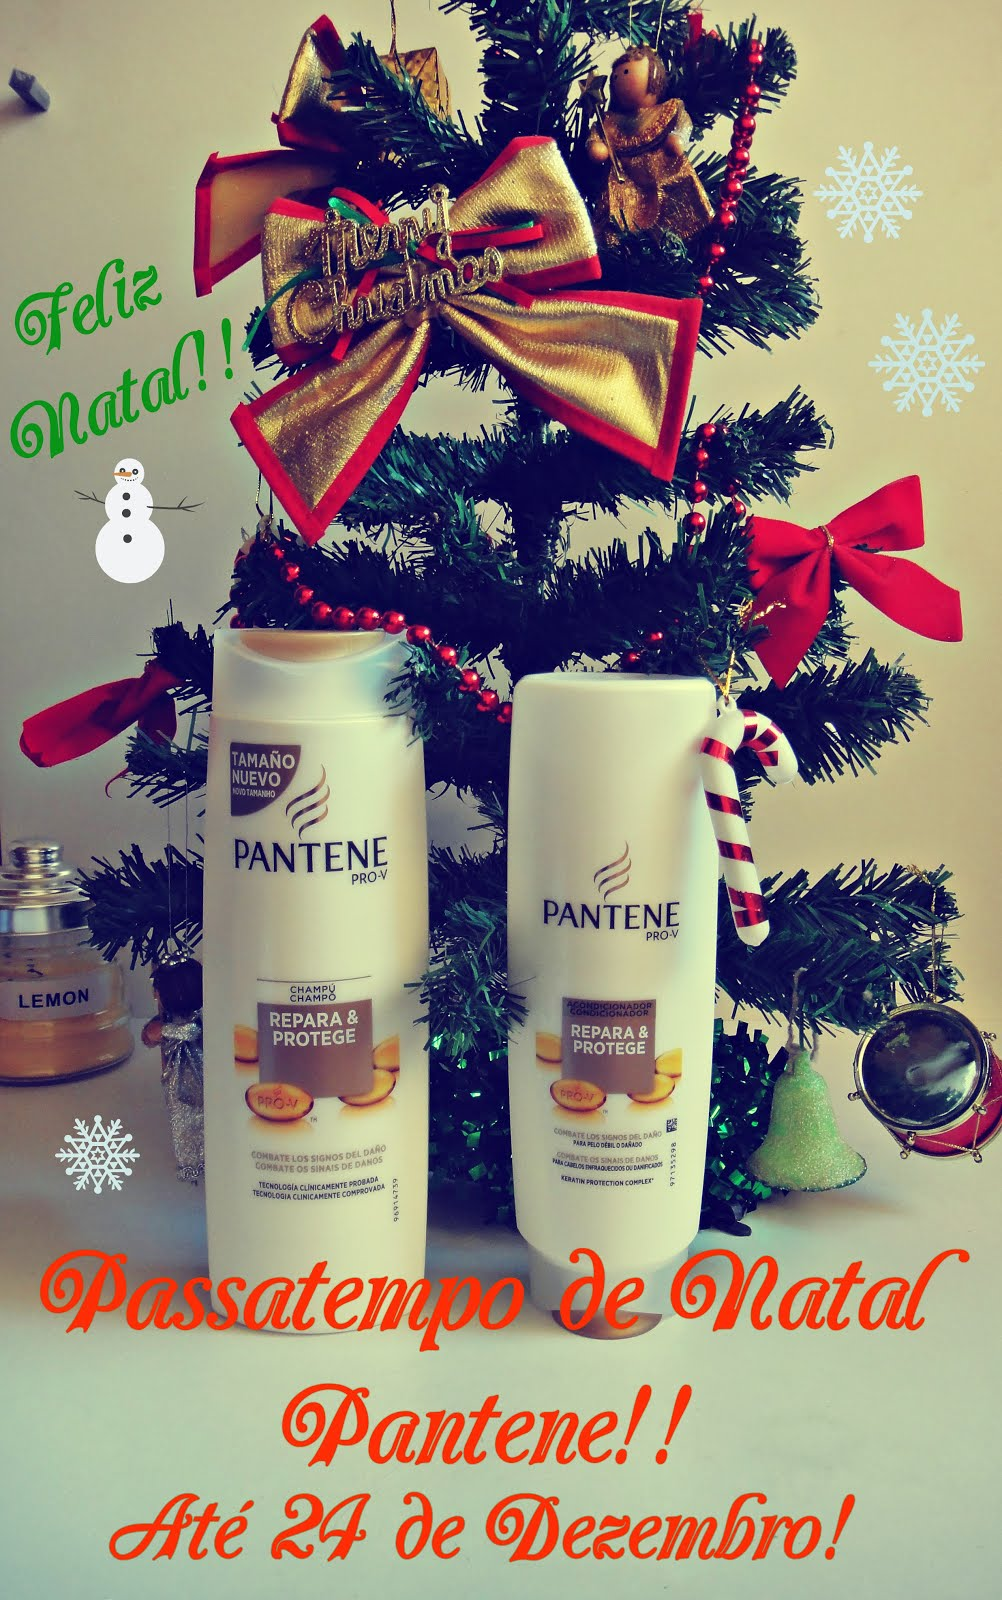 http://mustbepink.blogspot.com/2015/12/passatempo-de-natal-pantene-ate-24-de.html